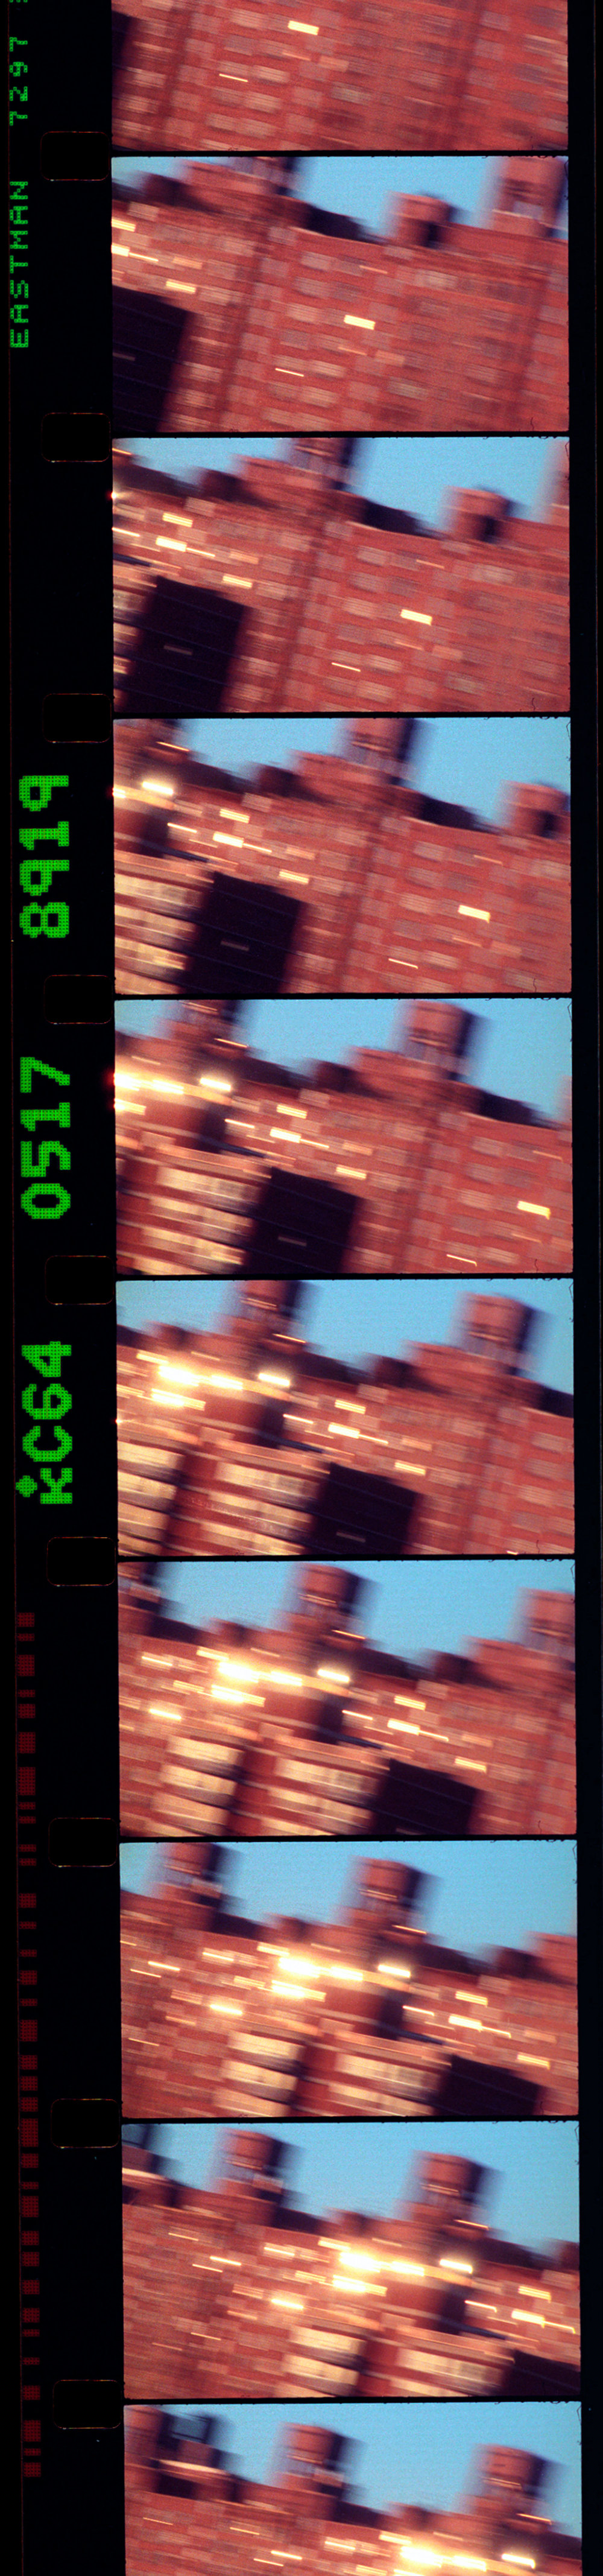 16mm-polo-building-blur-copy.jpg